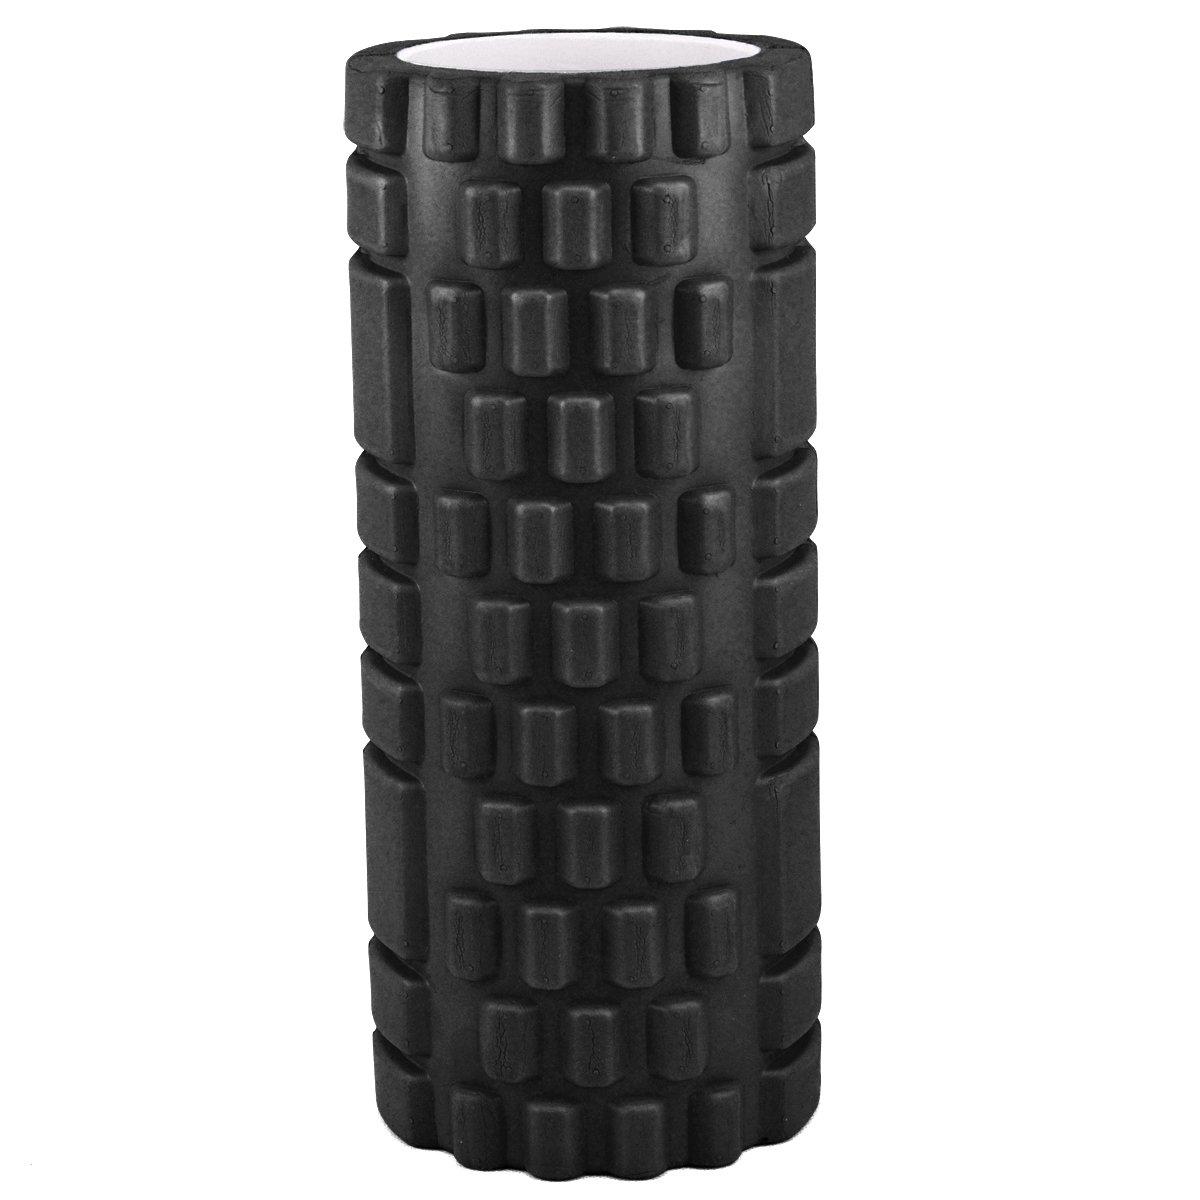 /34/cm x 14/cm etc/ tinkertonk/ Pilates Deportes Negro /con Textura Punto gatillo Ejercicio Yoga Rodillo de Espuma para Gimnasia Physio